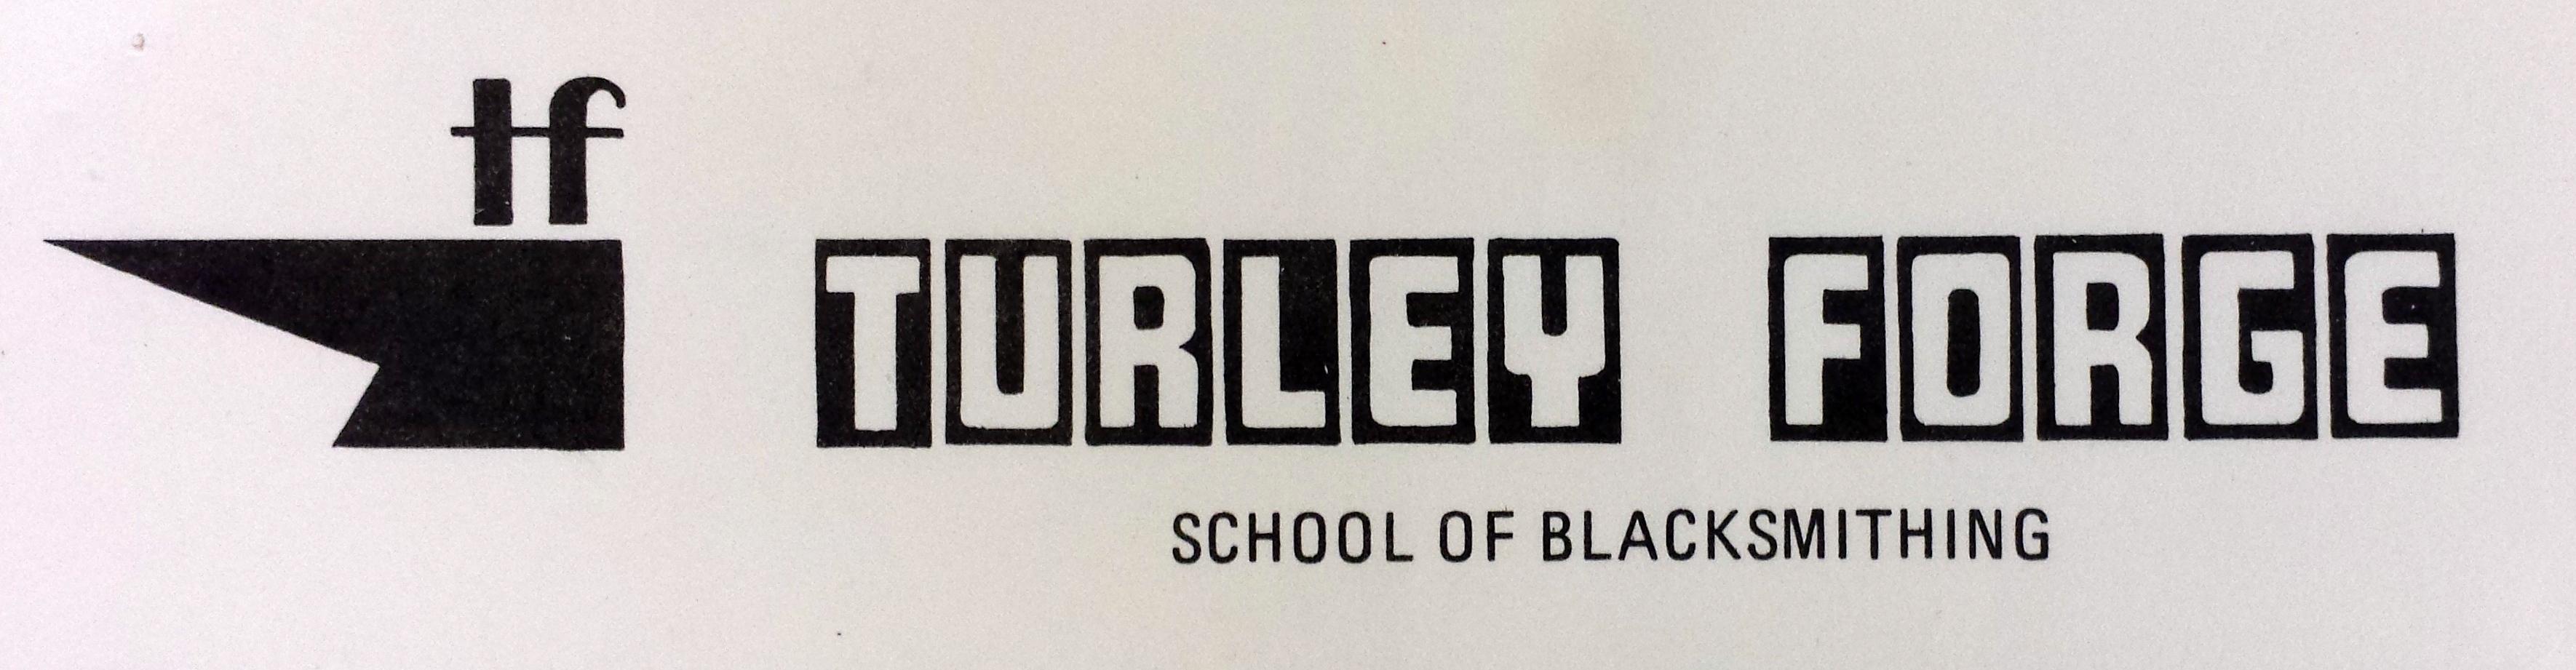 Turley Forge Blacksmithing School letterhead.